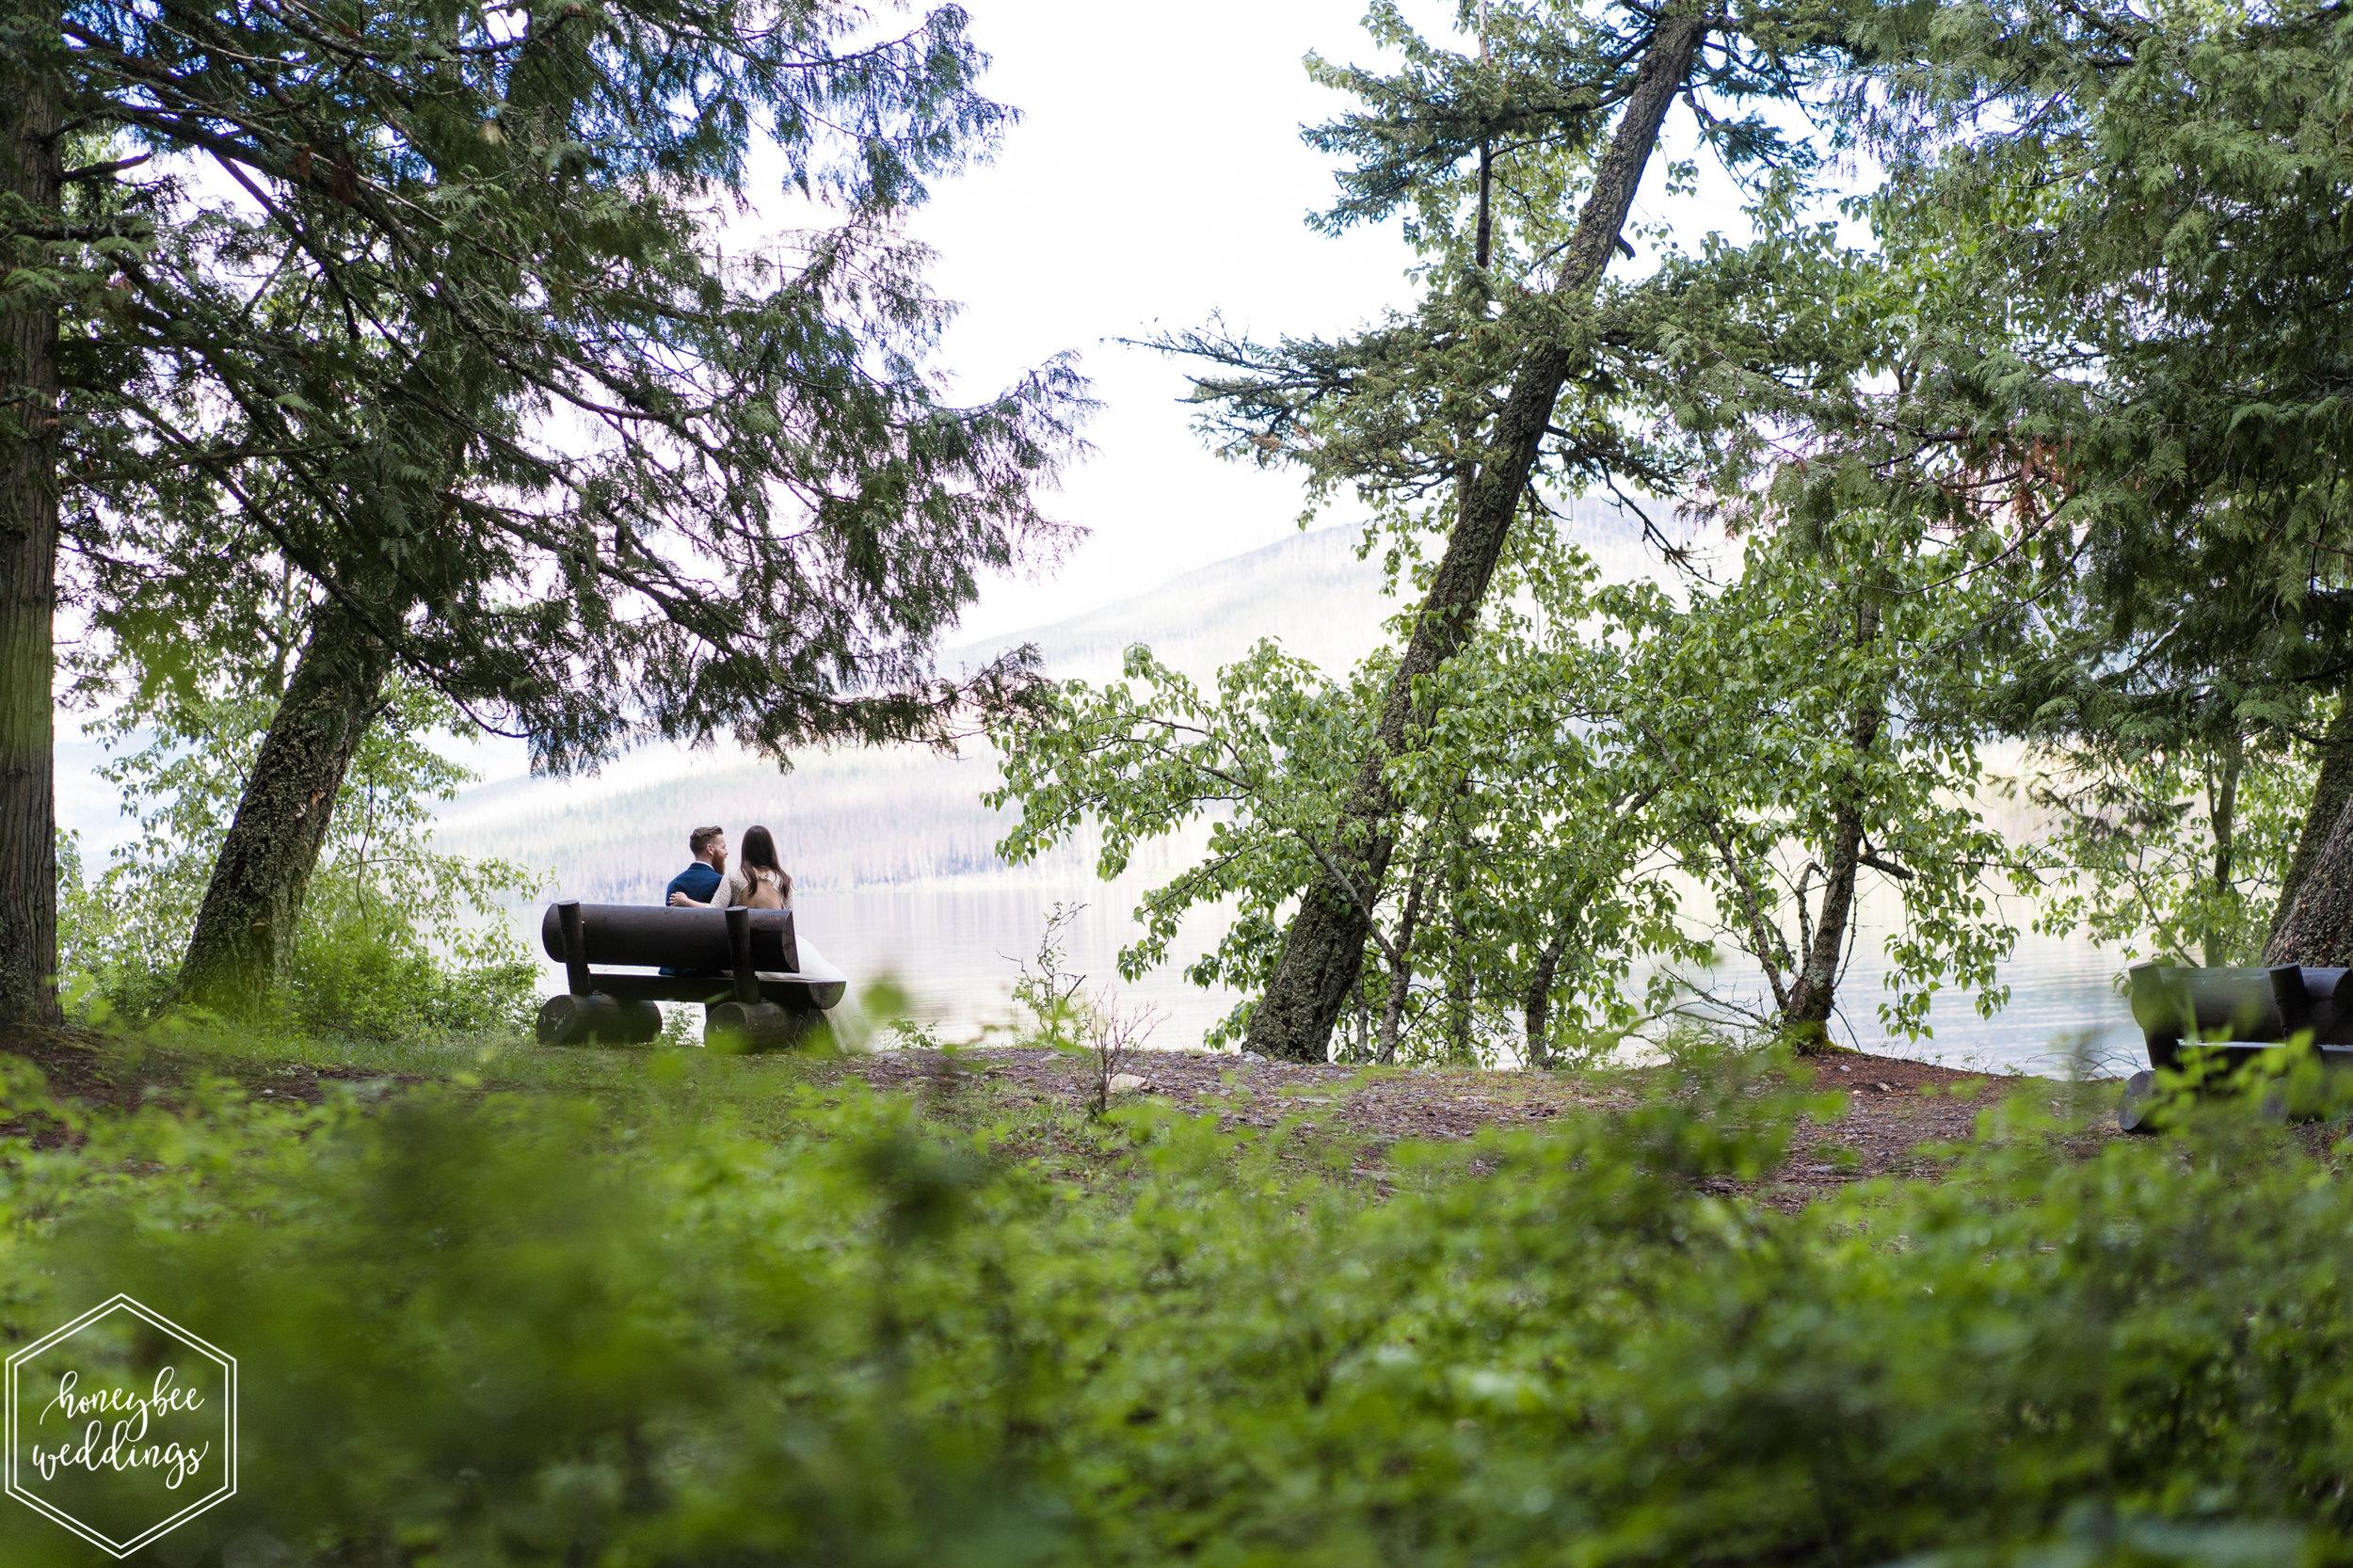 271Glacier National Park Wedding_Izaak Walton Inn Wedding_Honeybee Weddings_Norah & Kyle_June 09, 2019-108.jpg